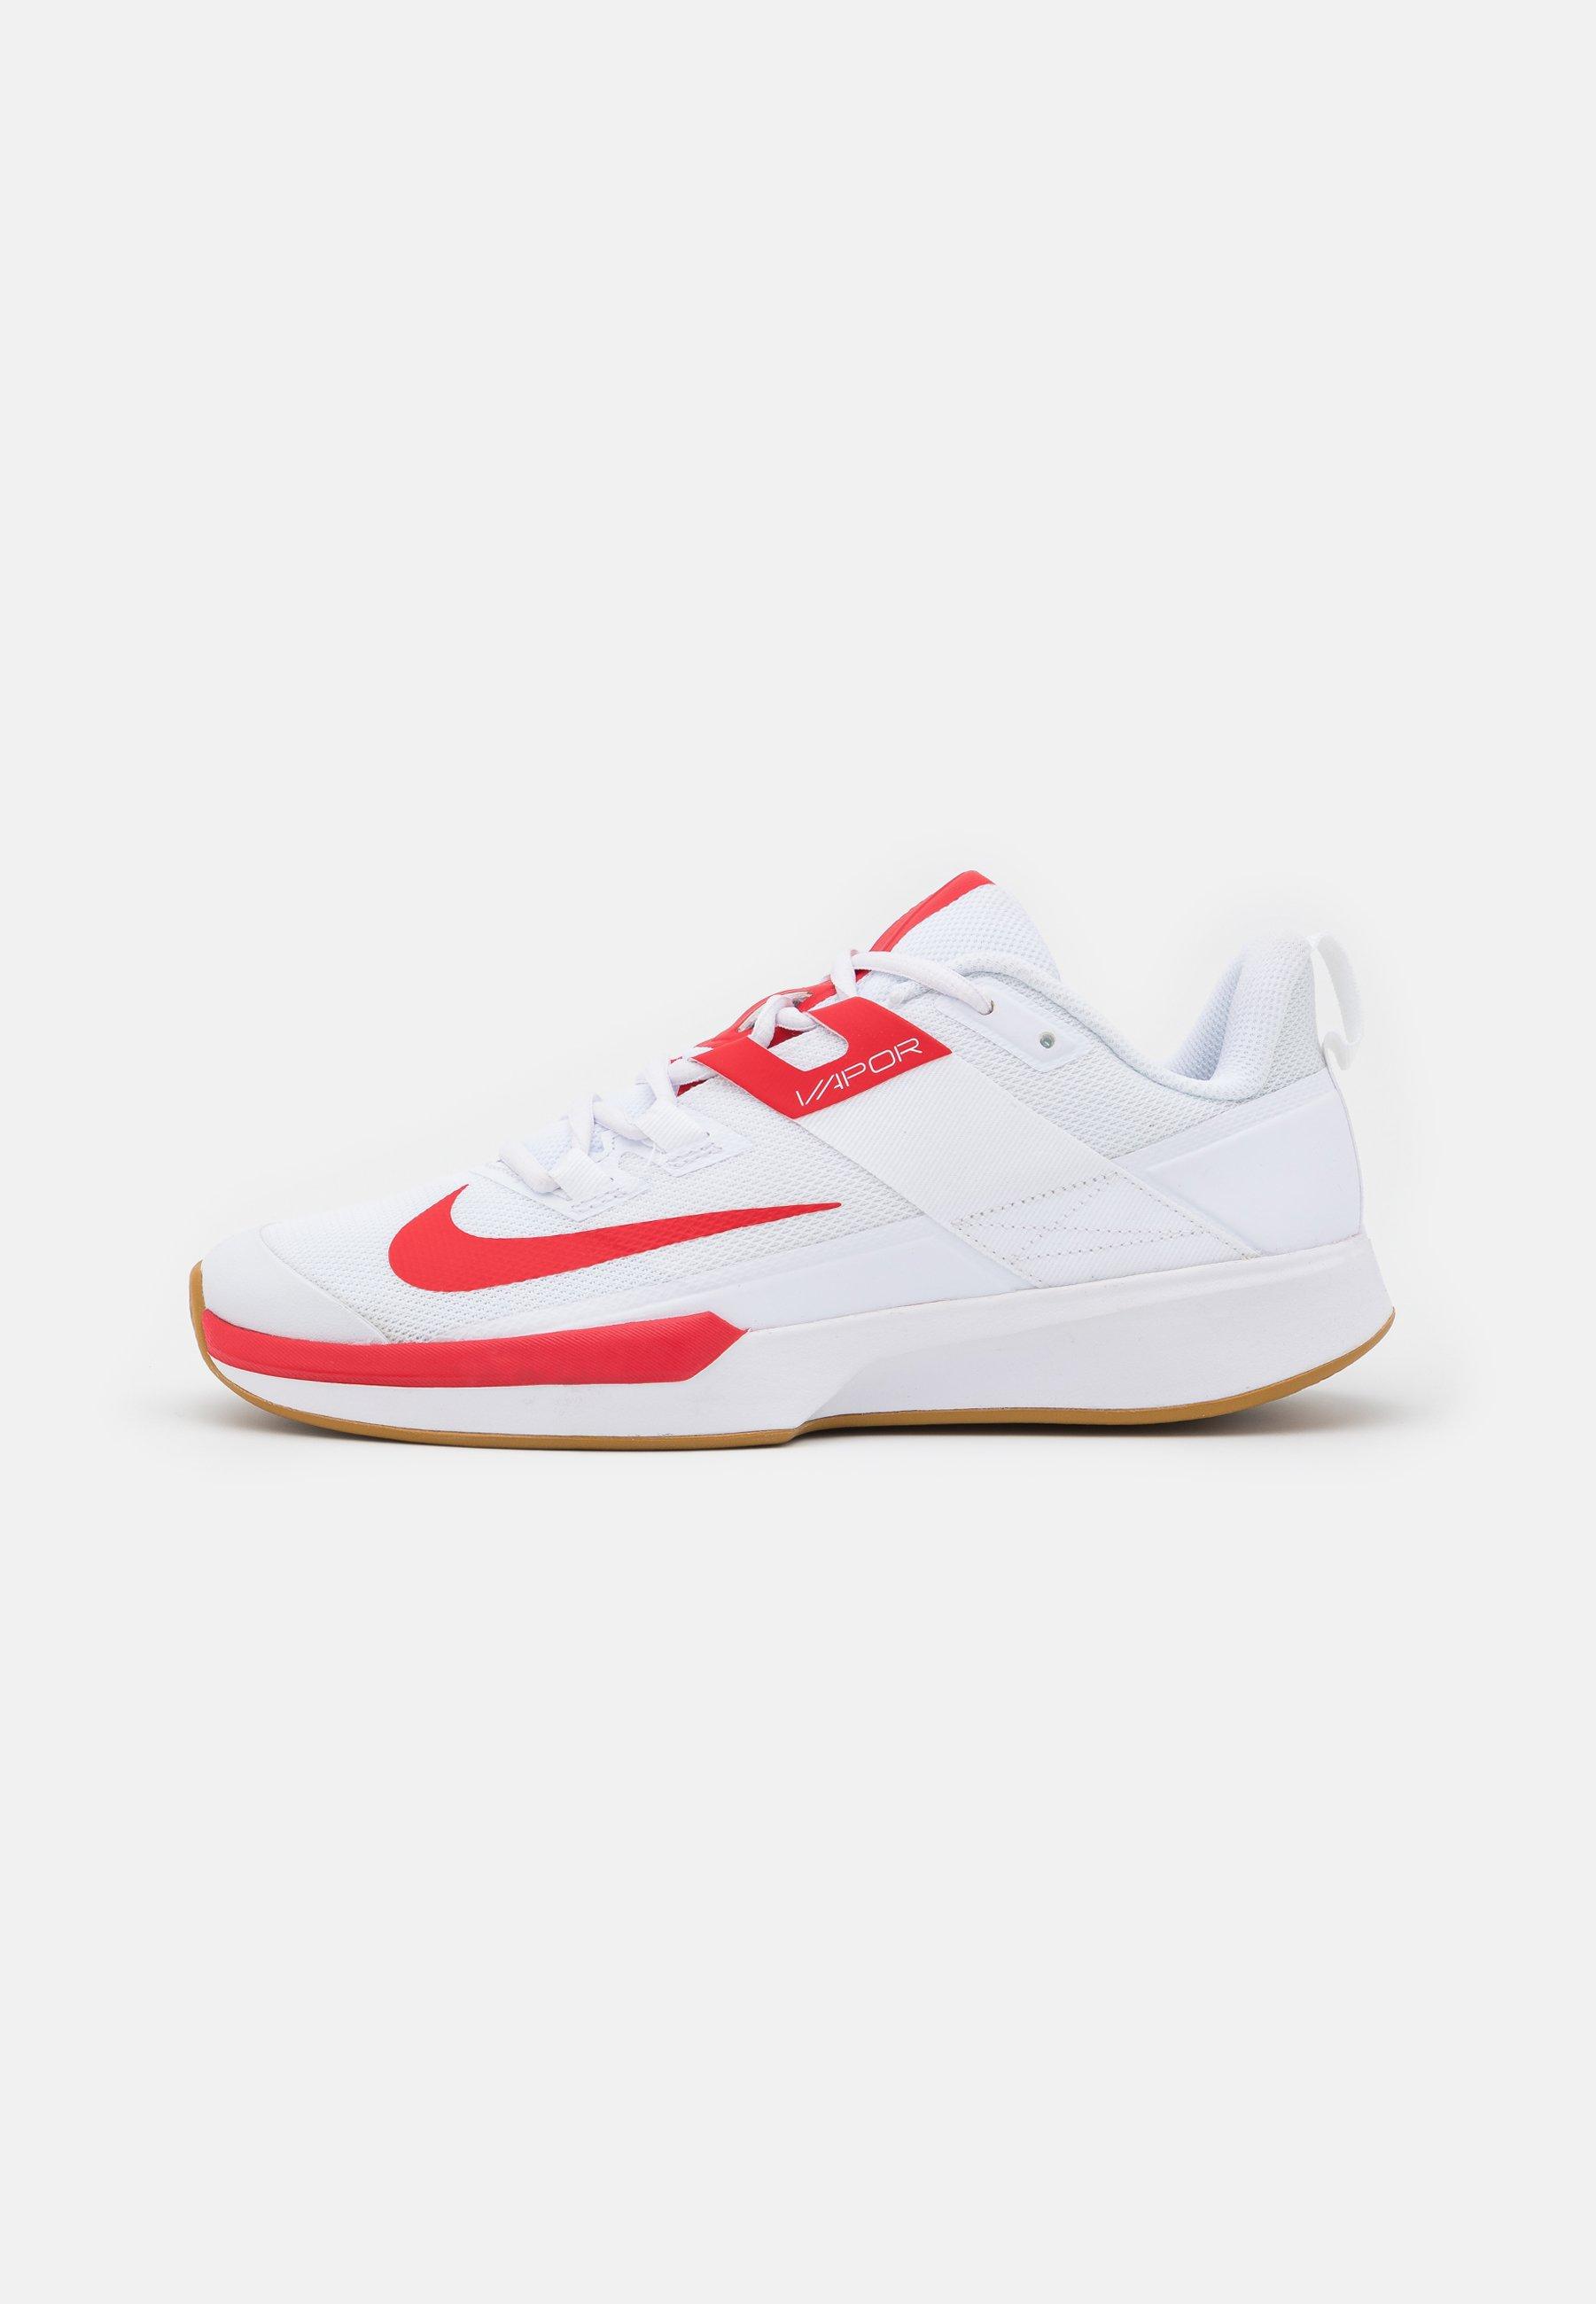 Men VAPOR LITE CLAY - Clay court tennis shoes